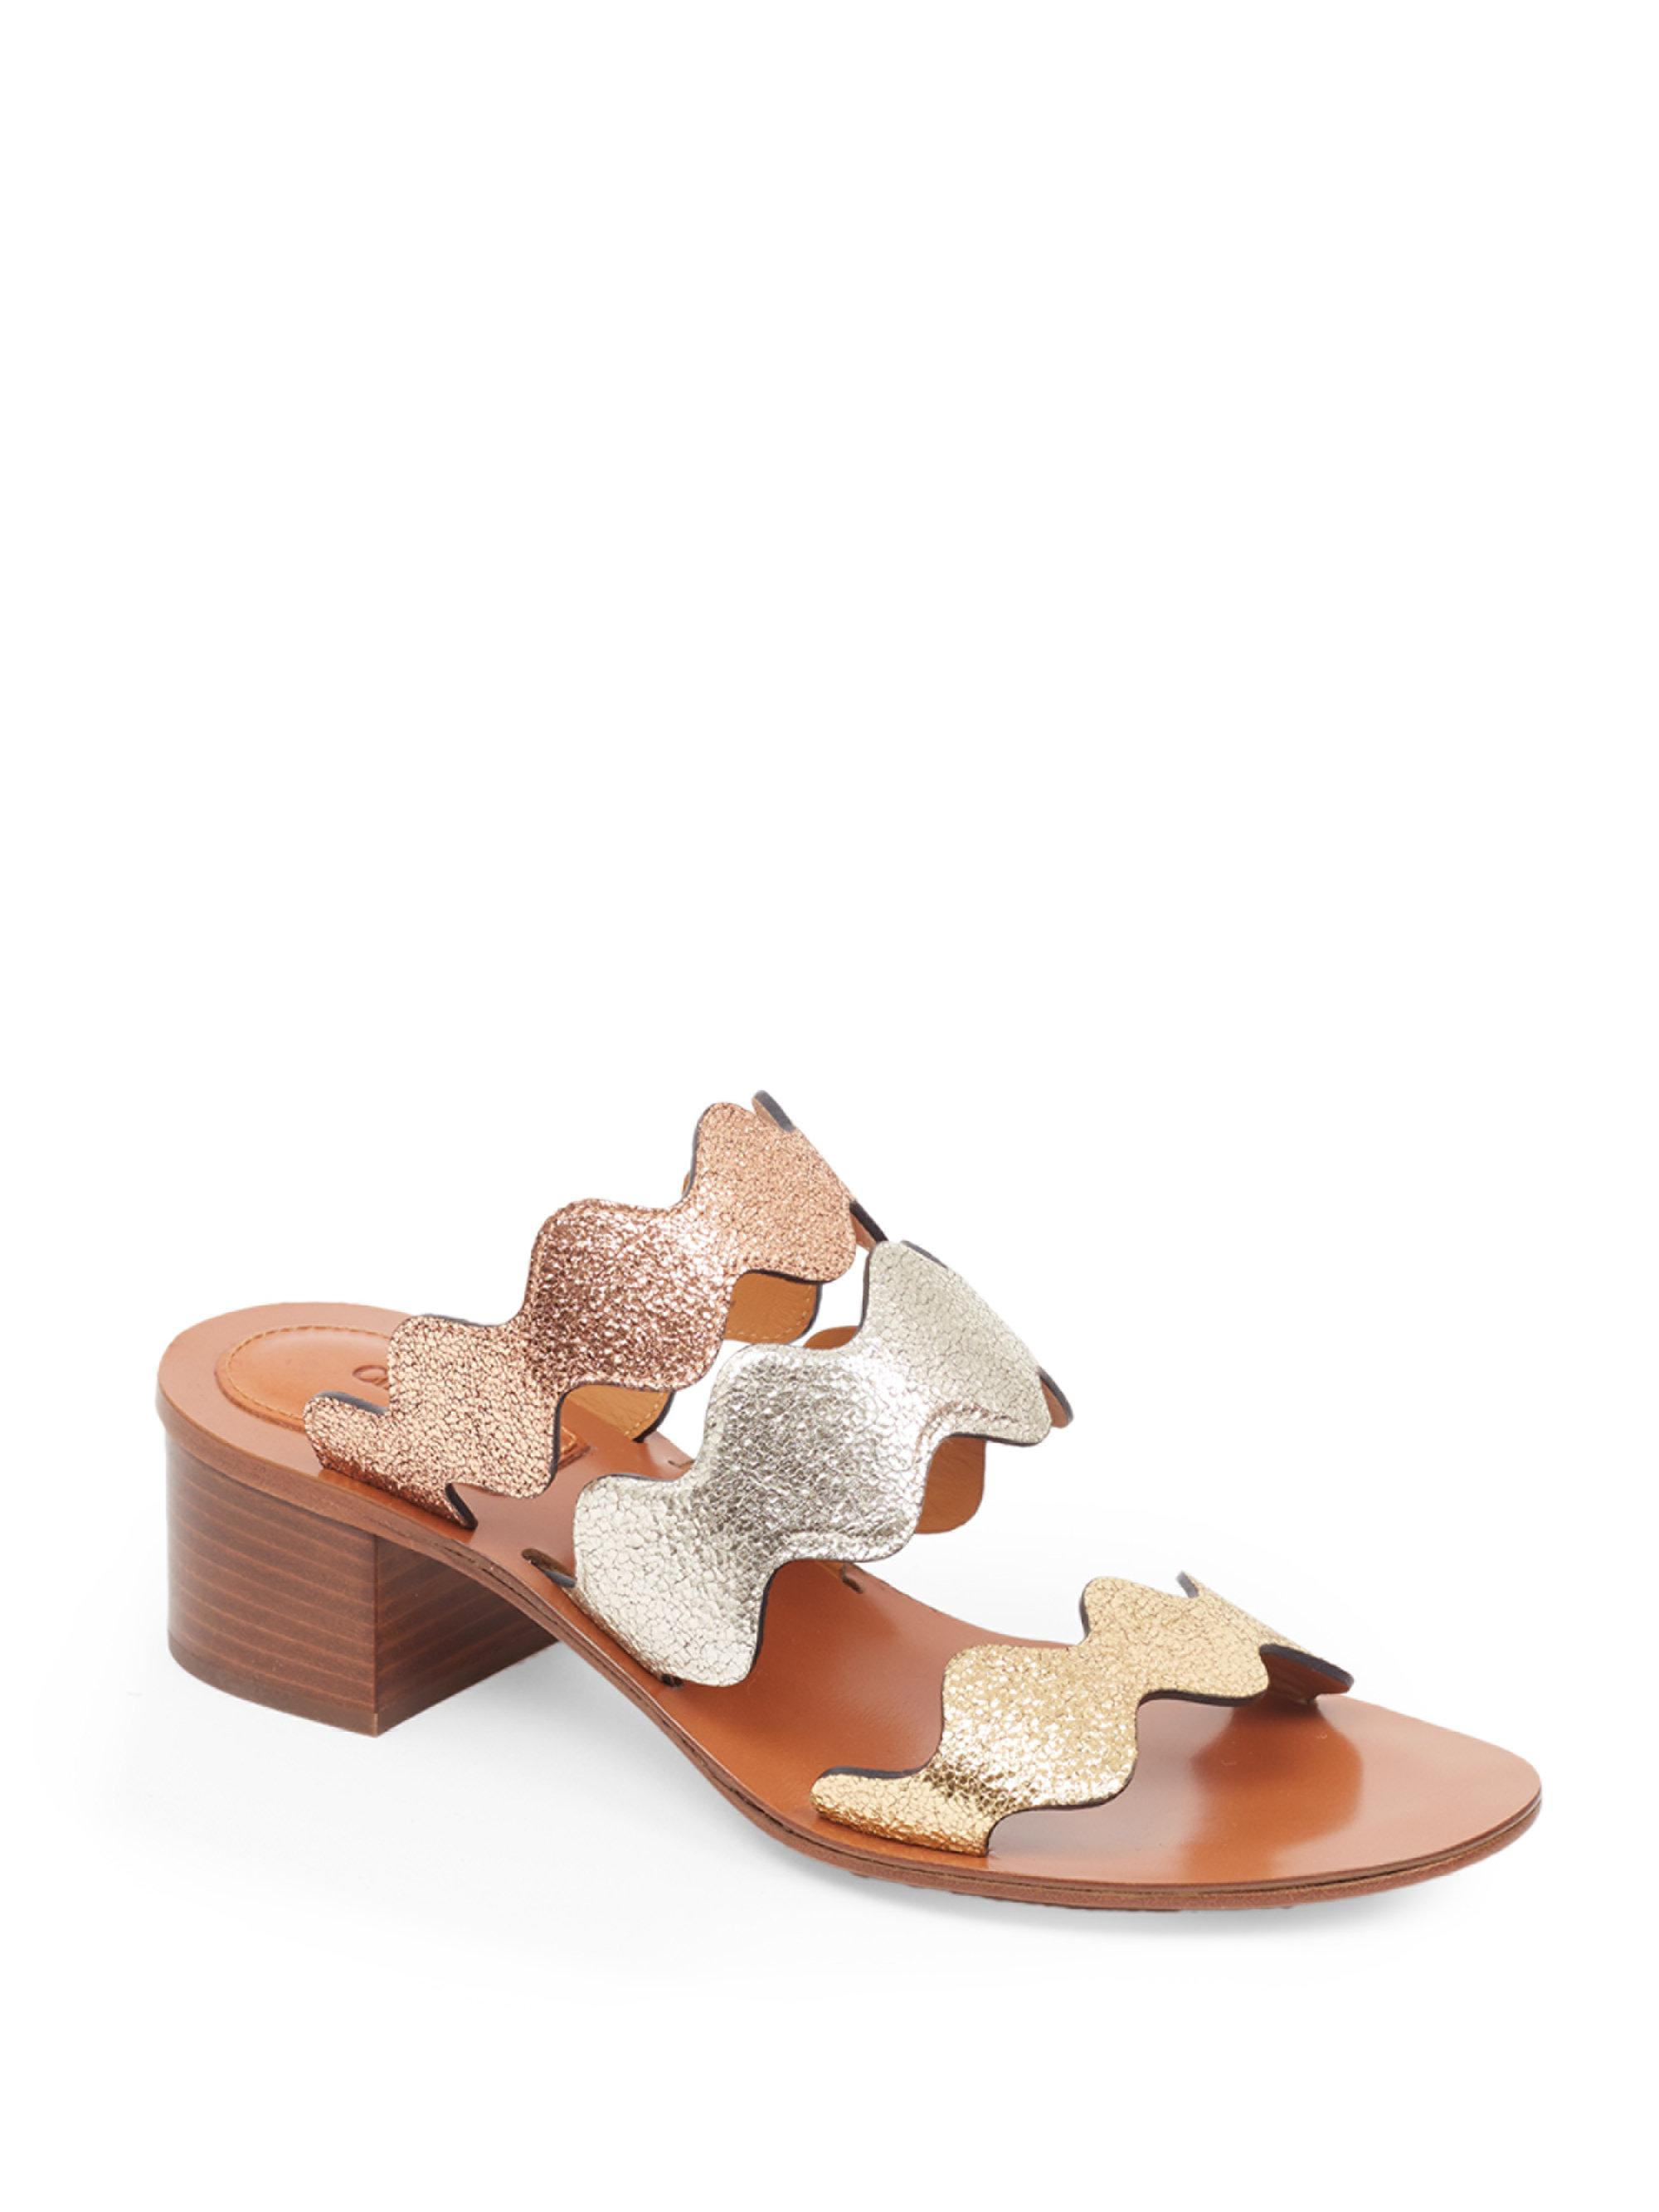 Chloé Loafer leather metal block heel BWI6wG